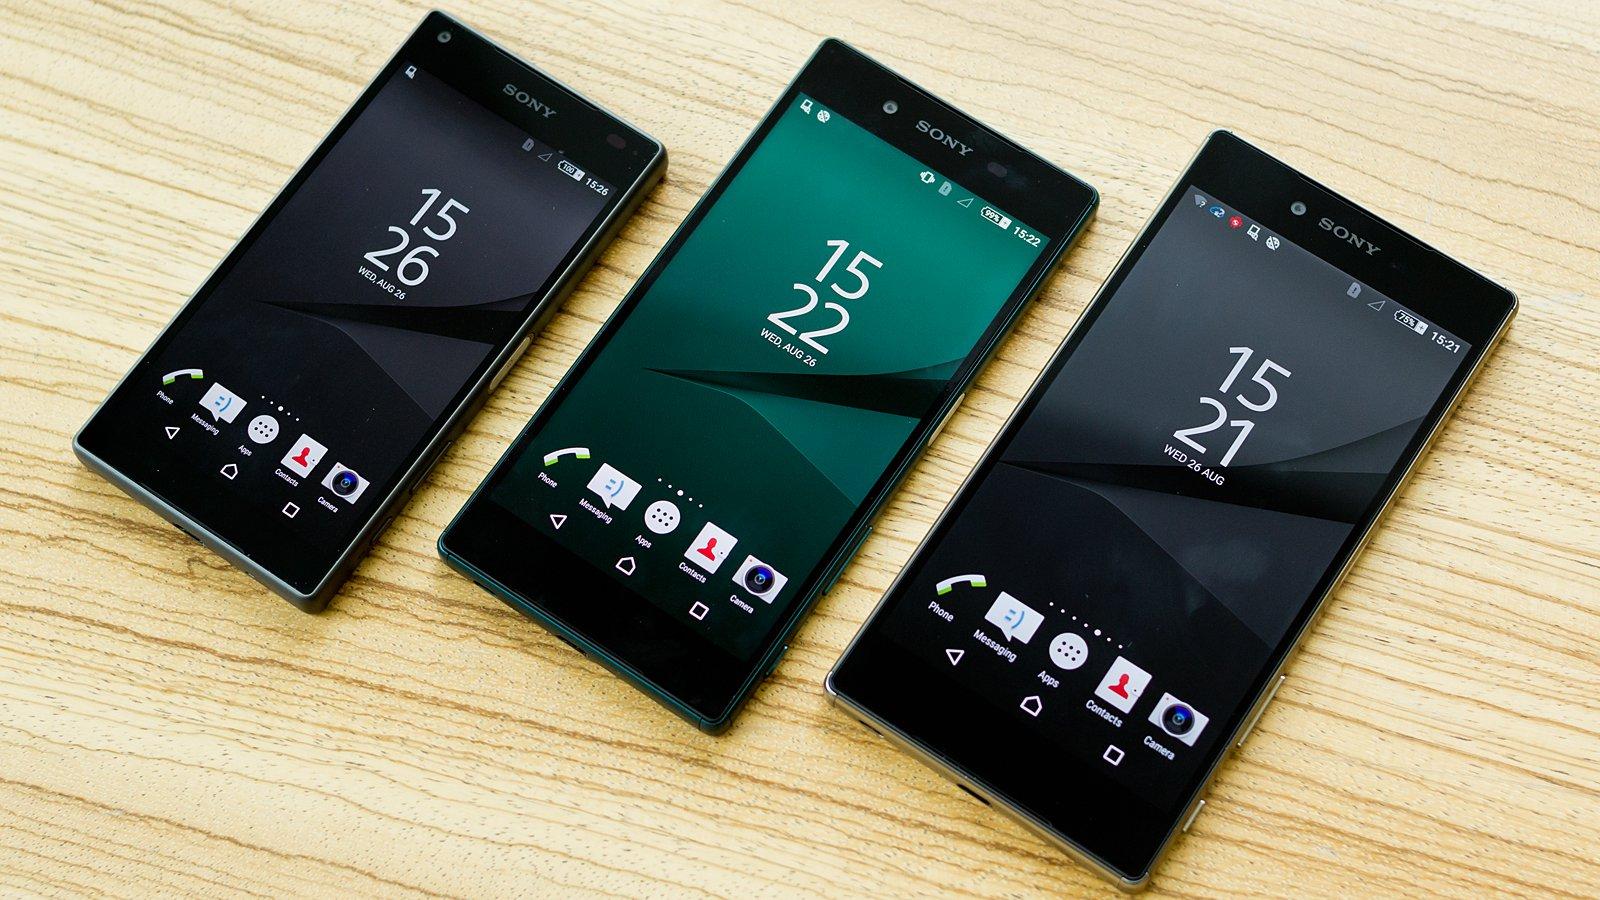 Какой смартфон лучше Сони или леново (sony или lenovo)